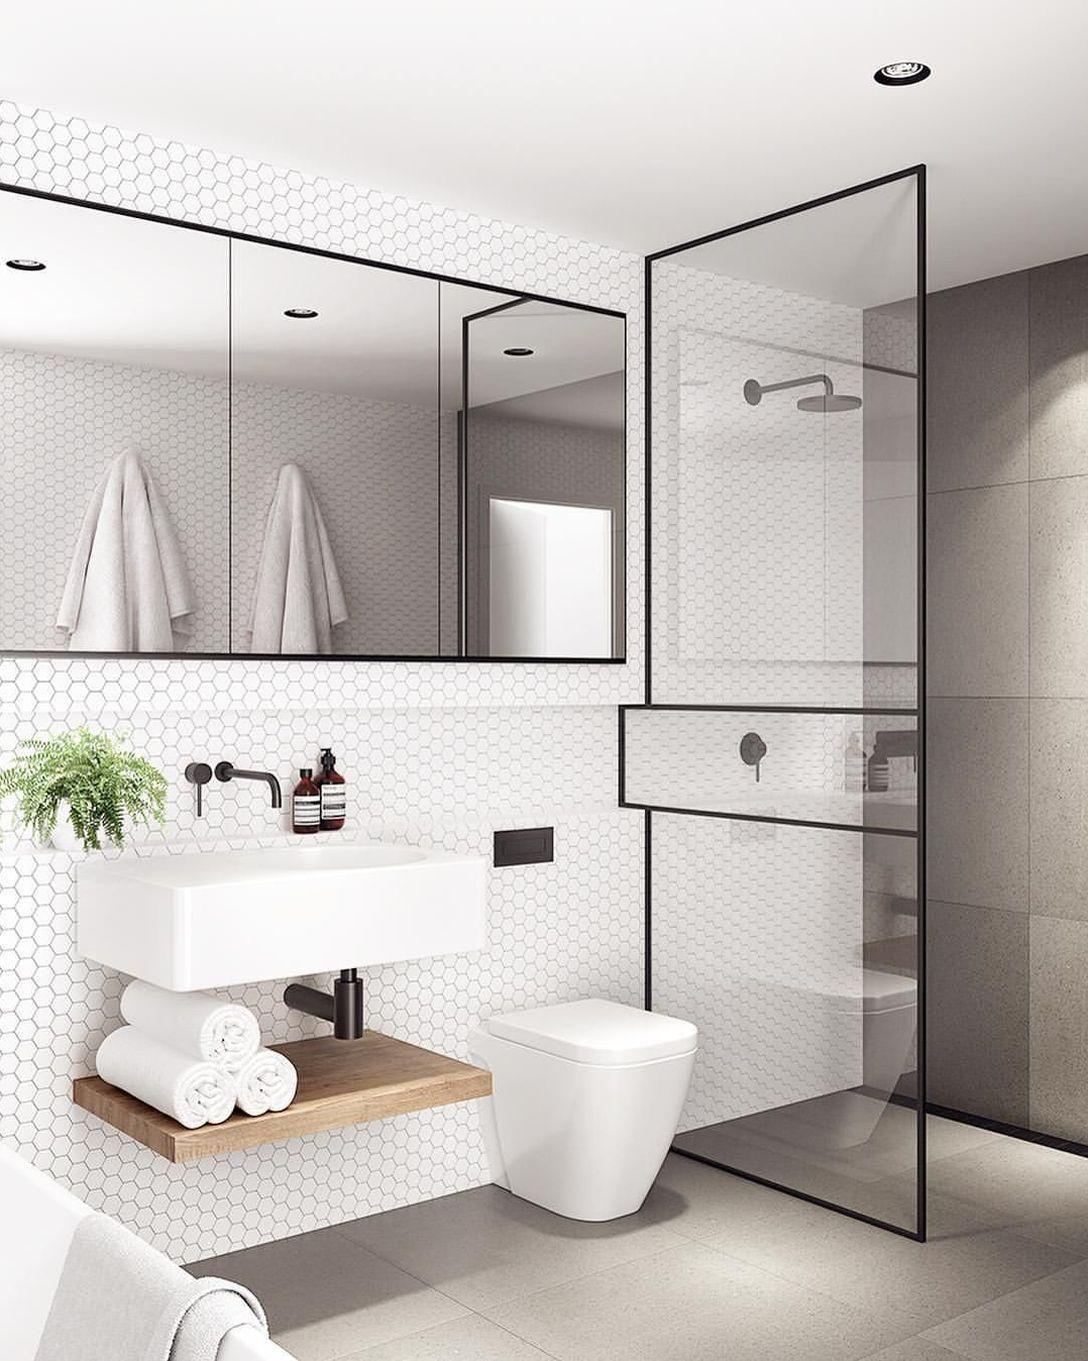 8 Best Scandinavian Style Interior Designs Brilliant 8 Best Scandinavian Style Interior D In 2020 Minimalist Bathroom Modern Bathroom Design Bathroom Interior Design